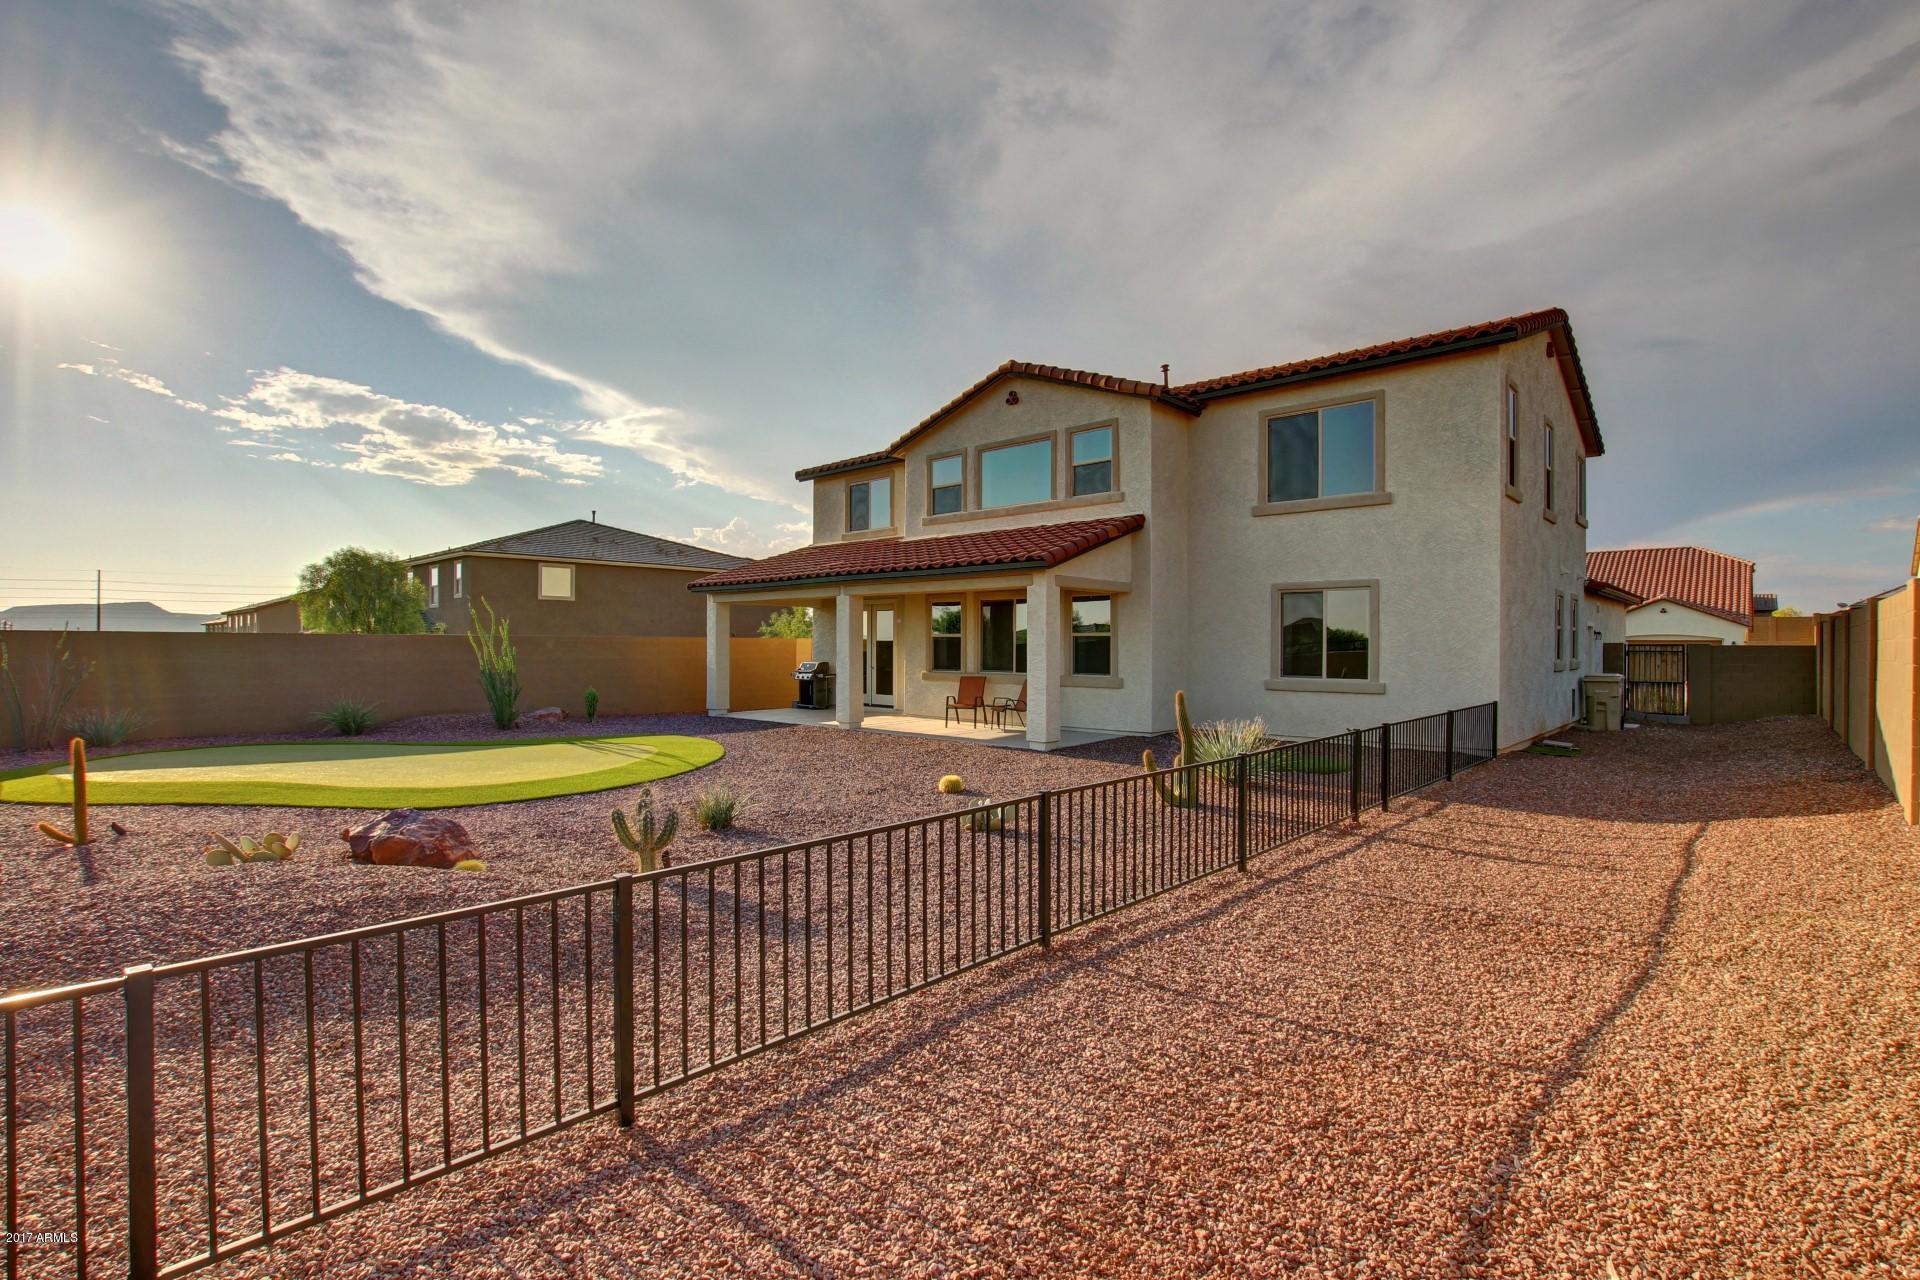 MLS 5654804 3775 W TERESA Drive, New River, AZ 85087 New River AZ Newly Built